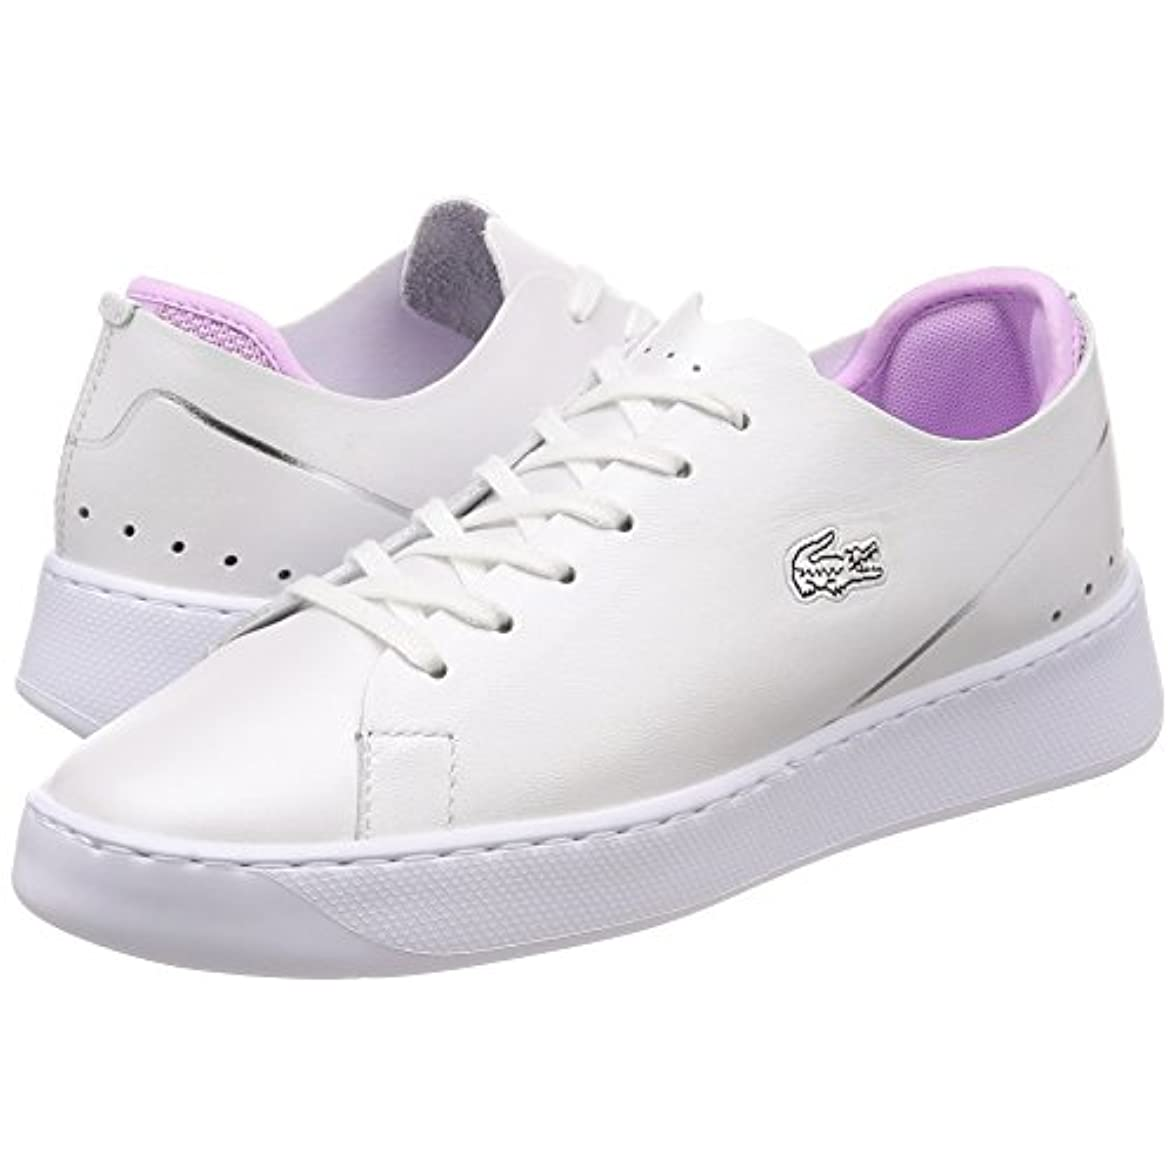 Lacoste Donna Bianco Light Porpora Eyyla 118 1 Sneaker